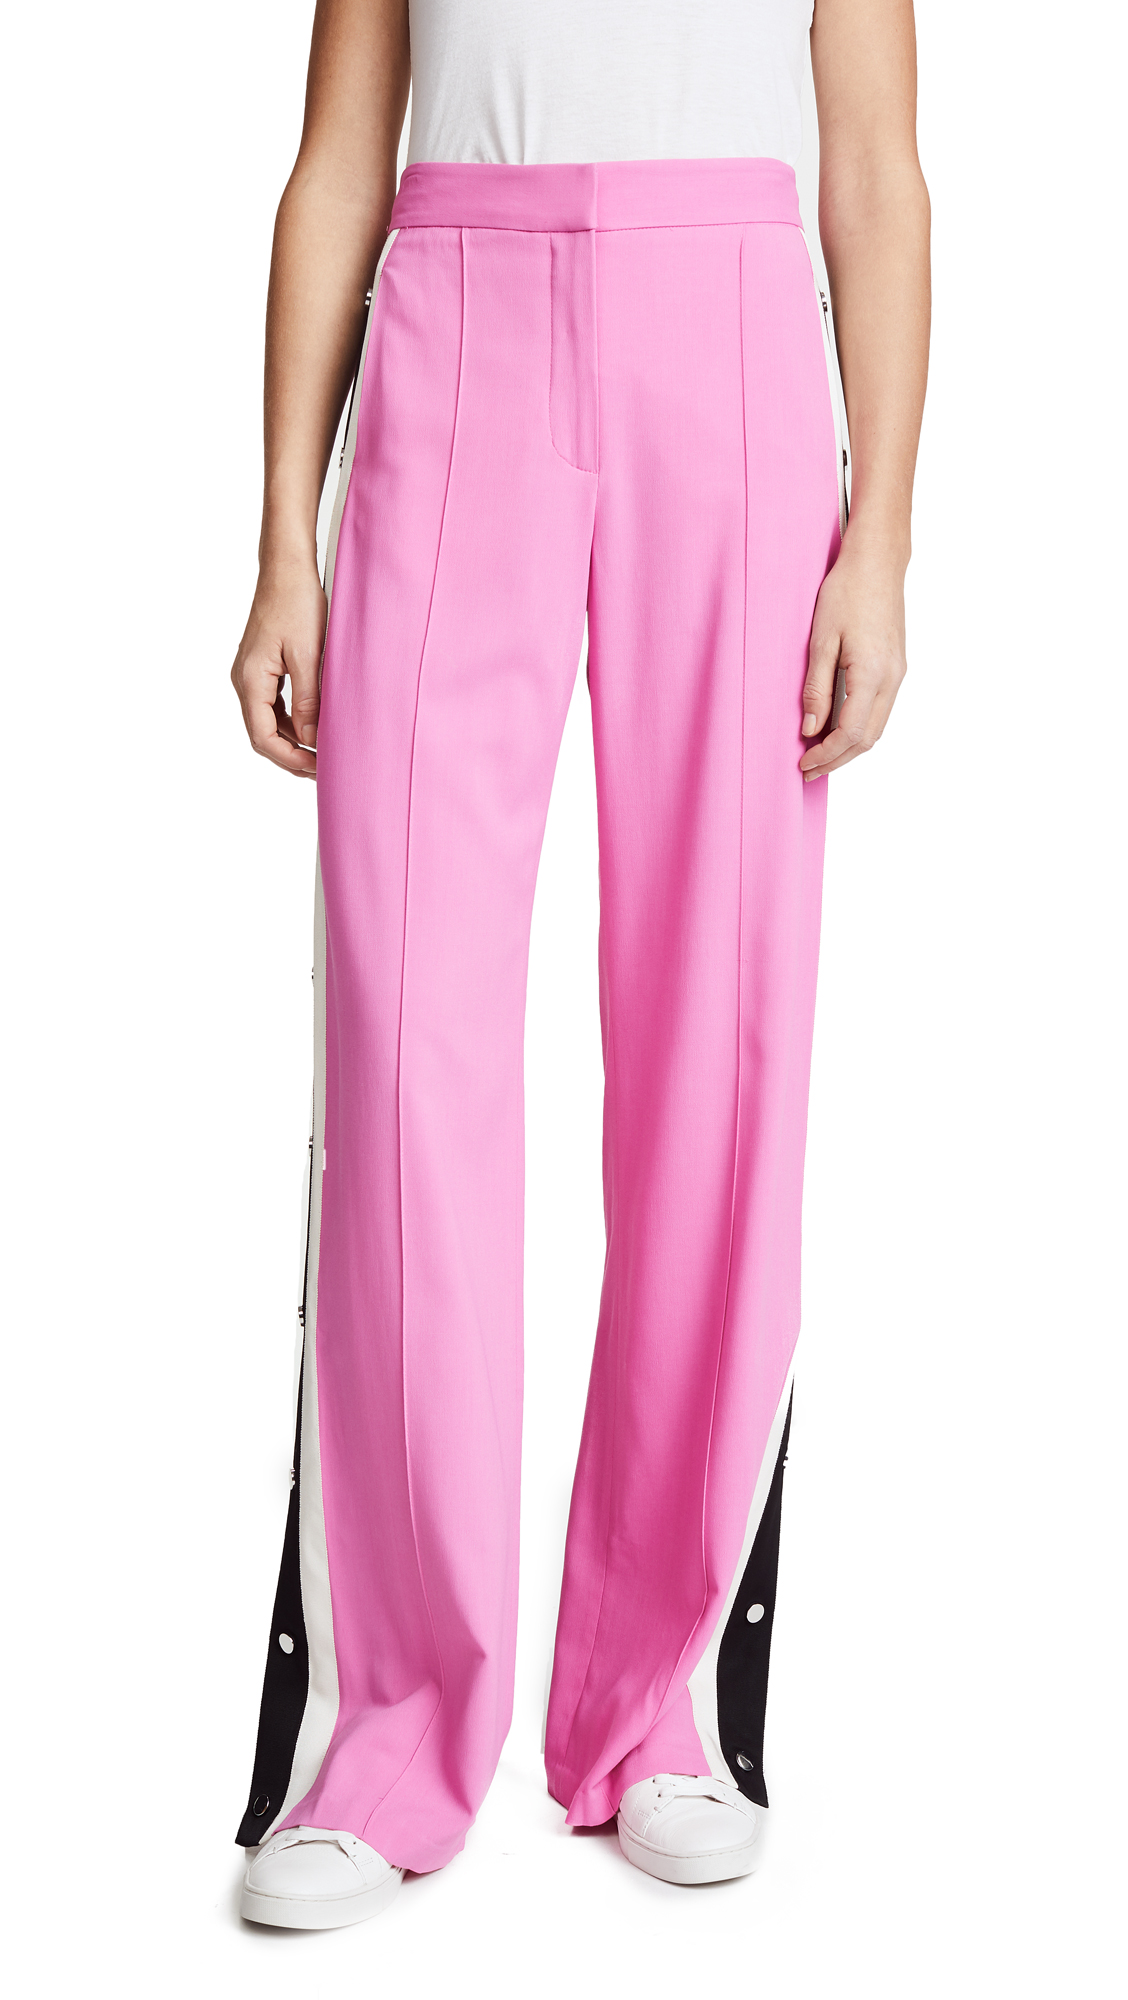 Veronica Beard Russo Trousers - Light Fuchsia Pink